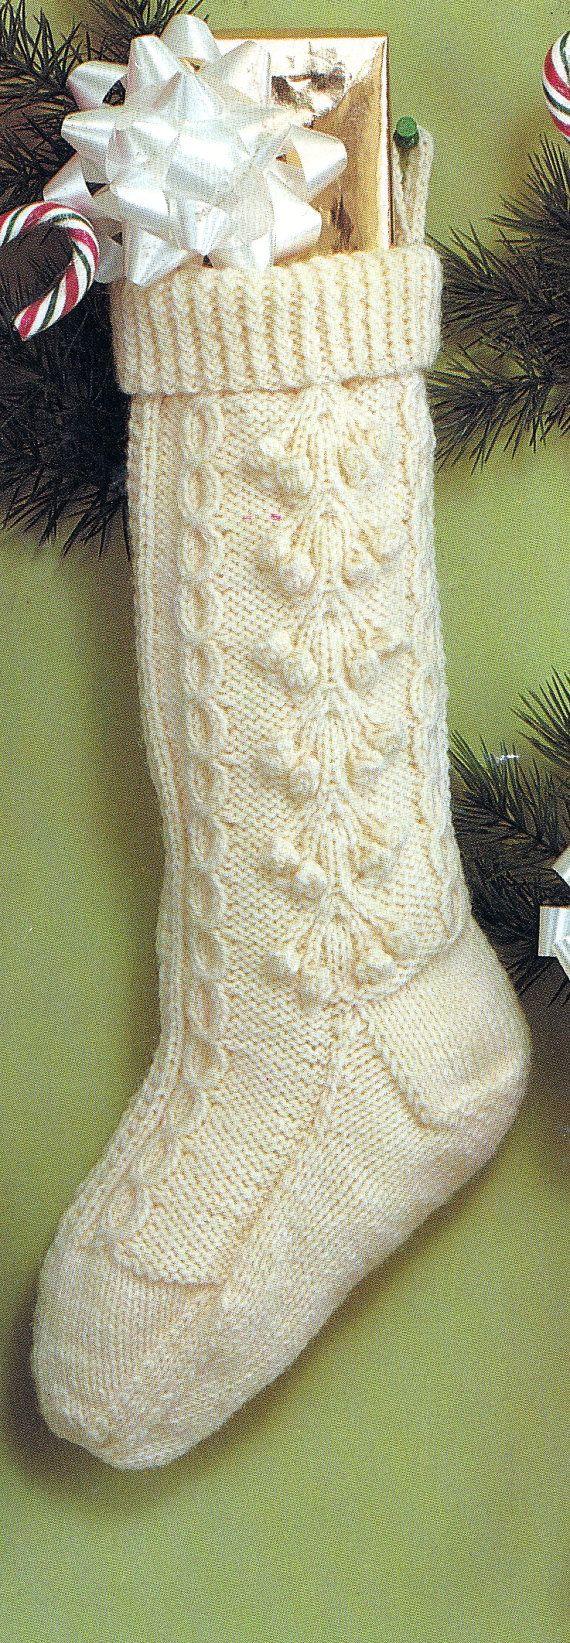 Knit Christmas Fisherman Stocking Vintage Knitting PDF PATTERN Retro padurns ...